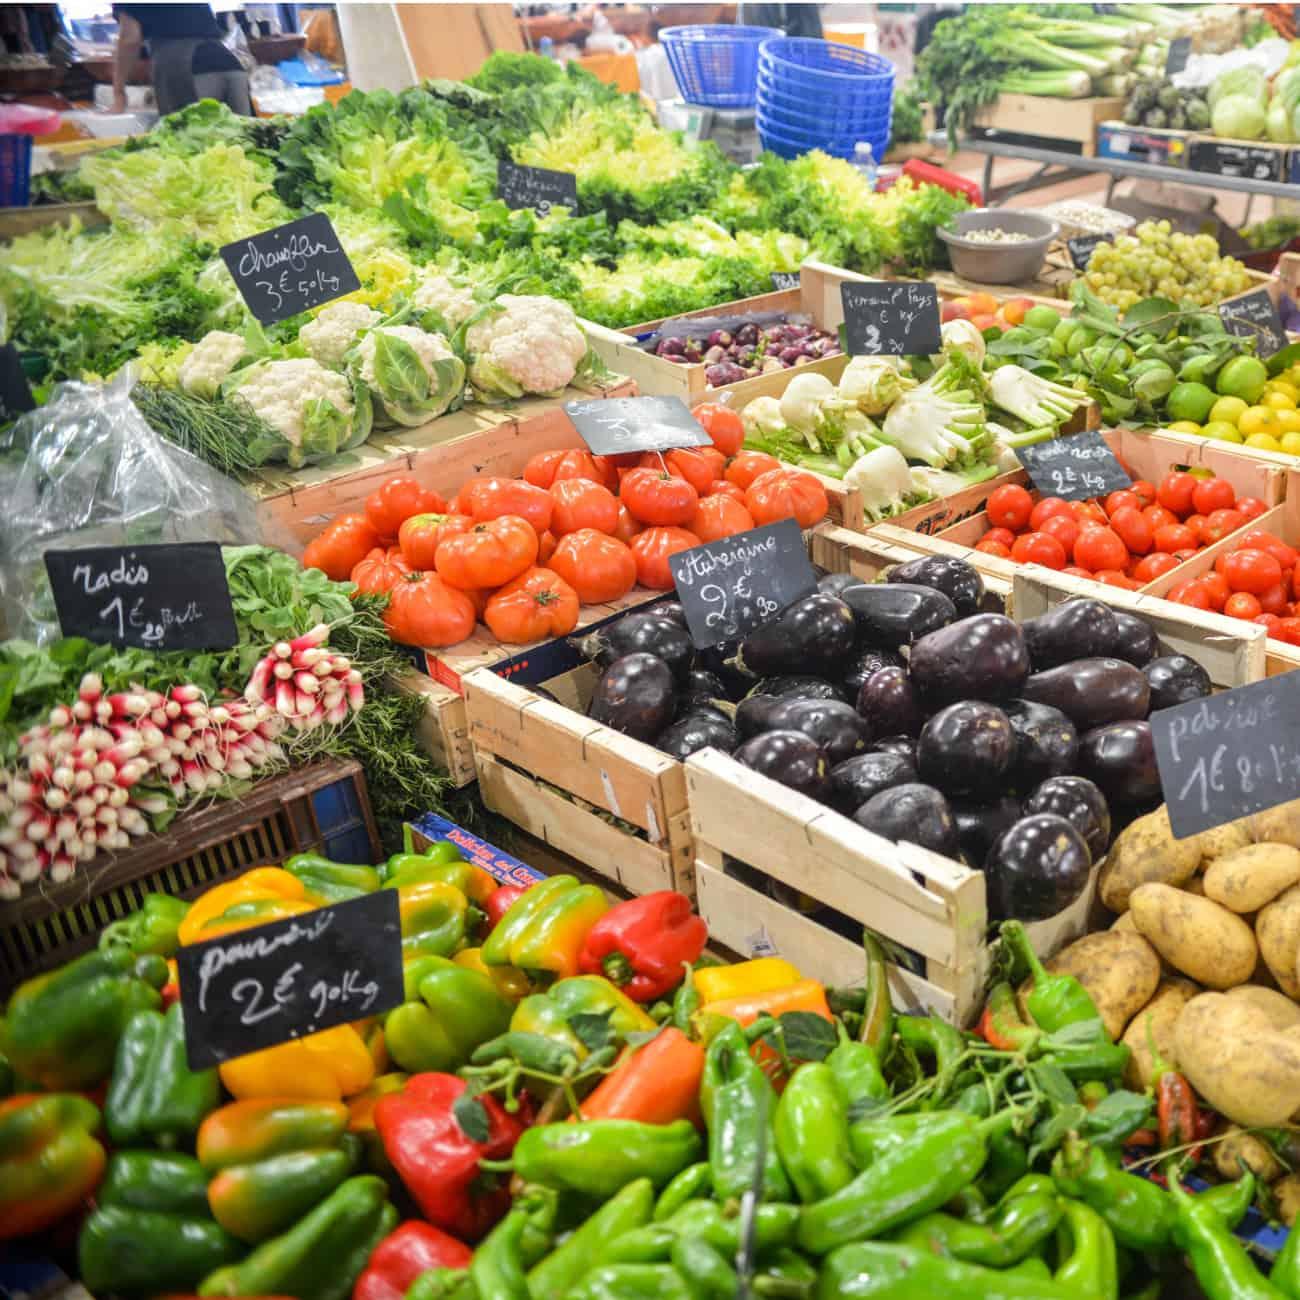 cheapest seasonal produce display at farmers market.